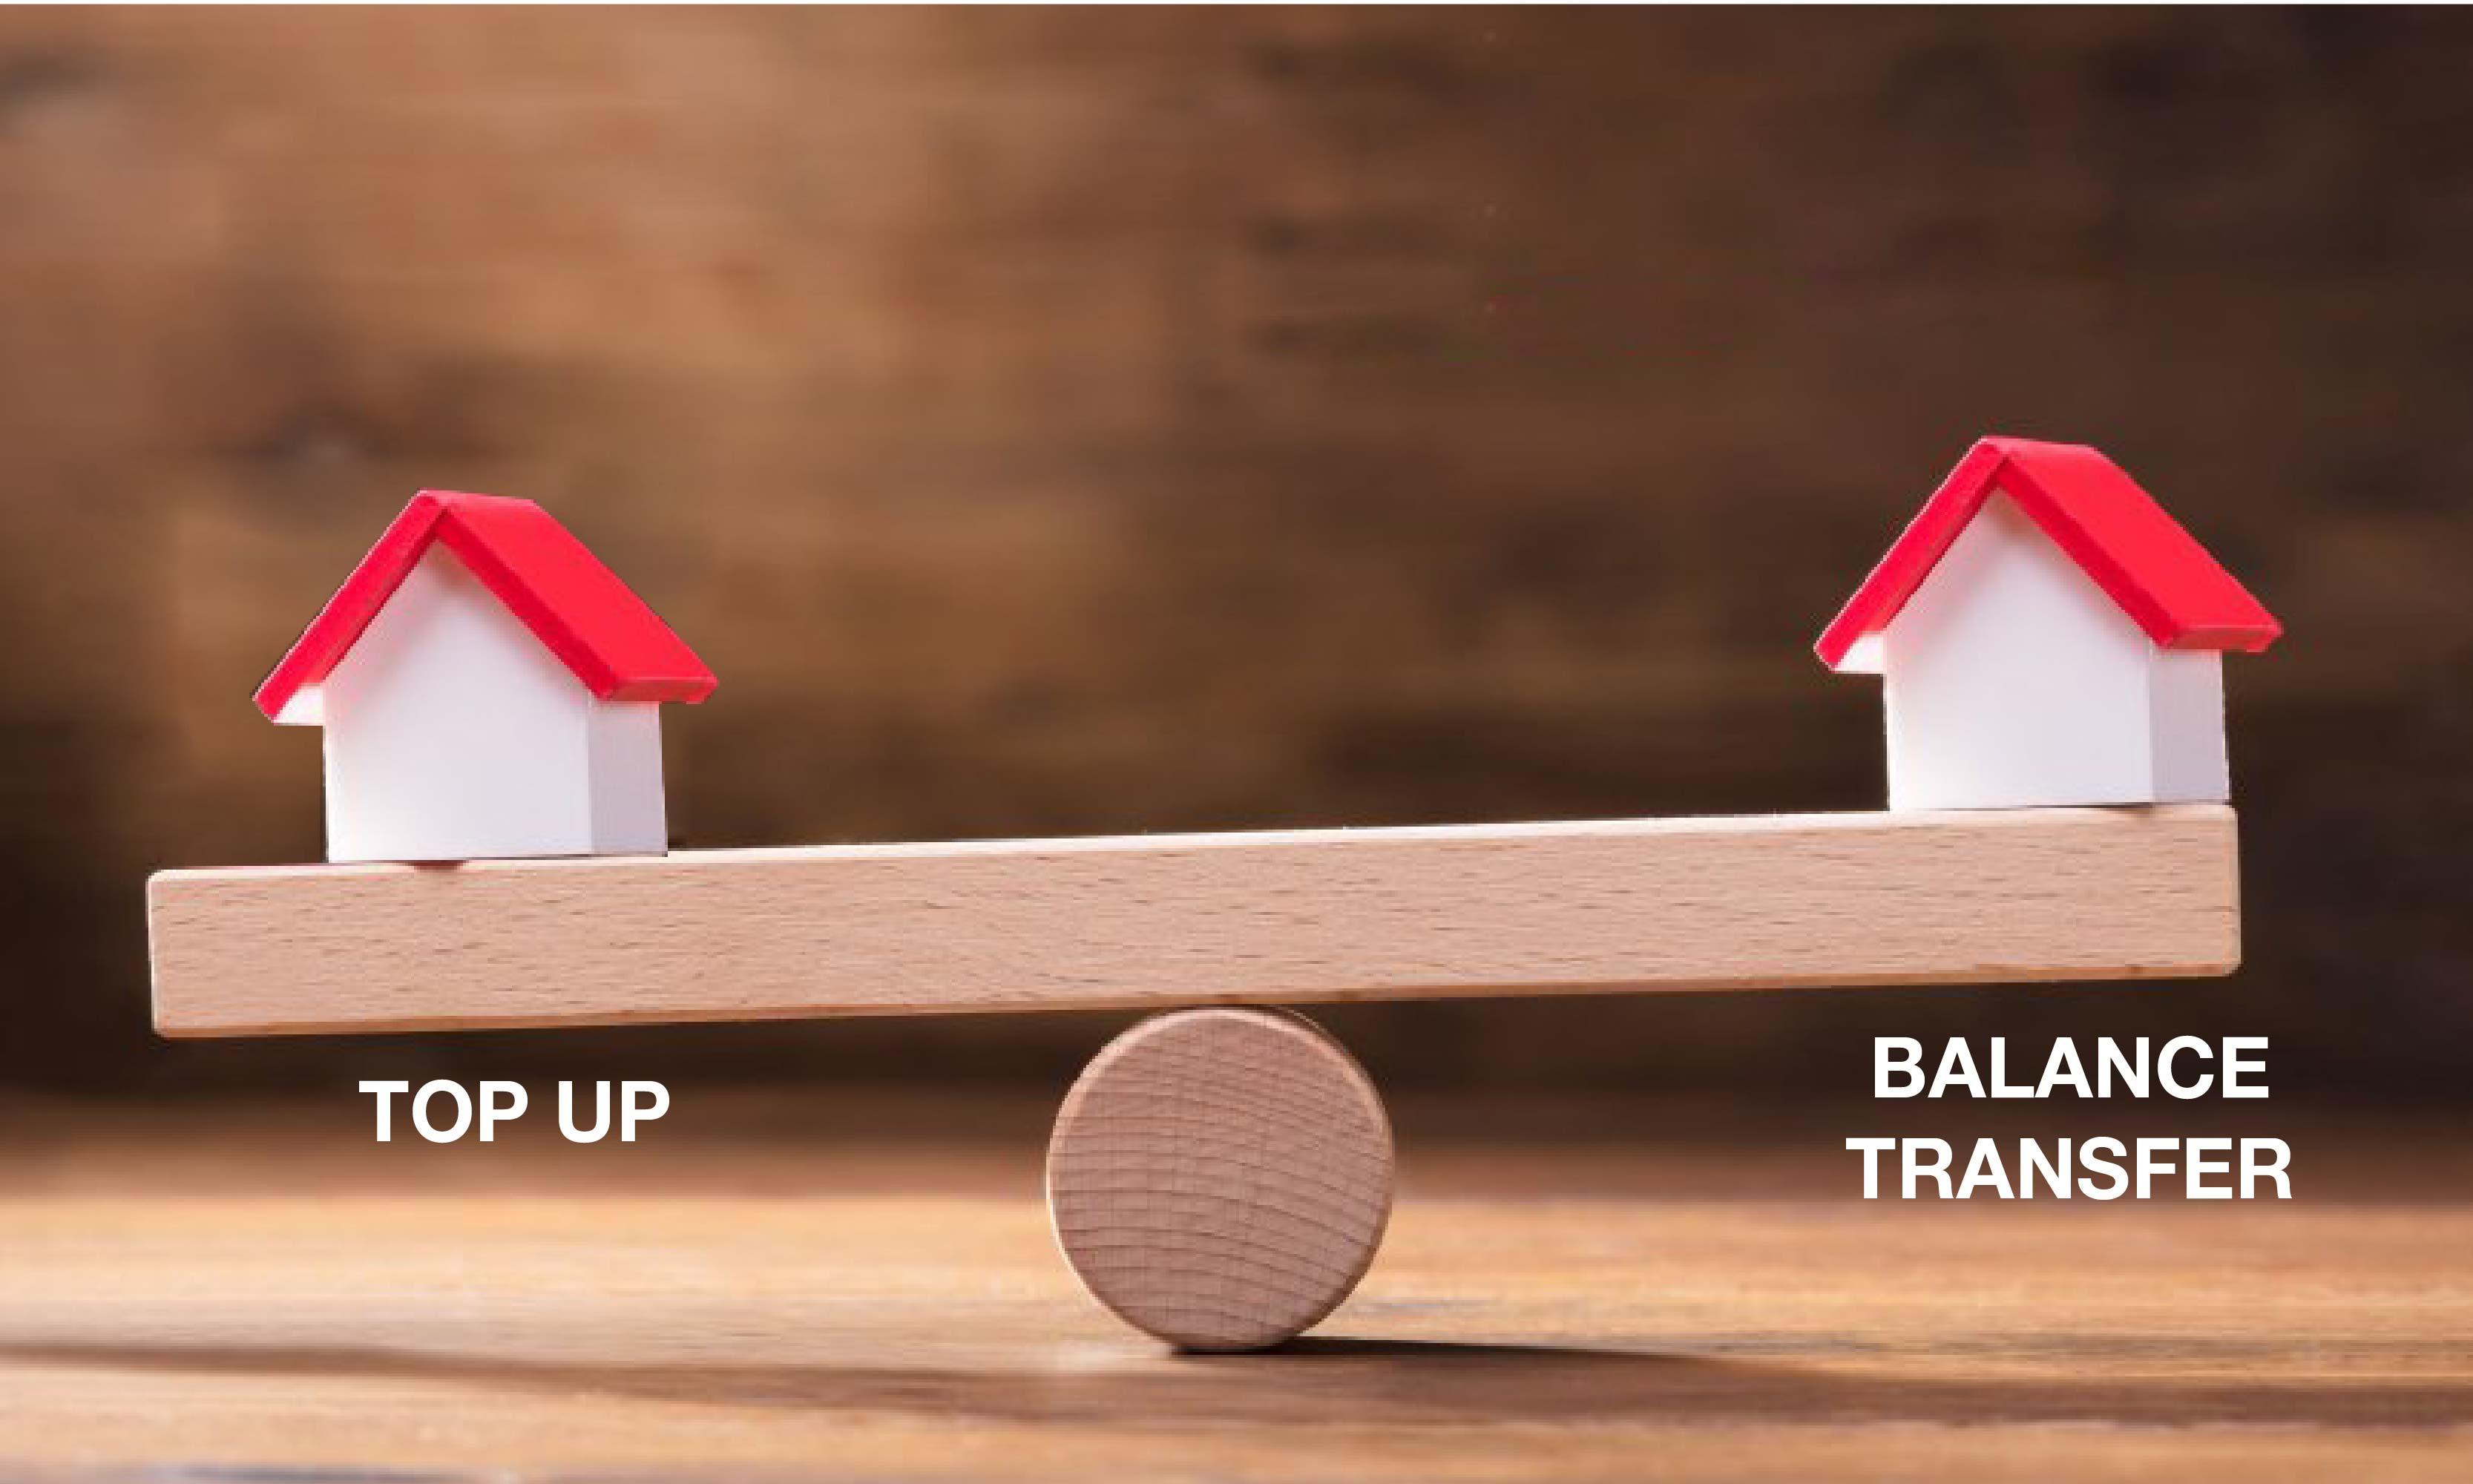 Home Loan Balance Transfer & Top Up